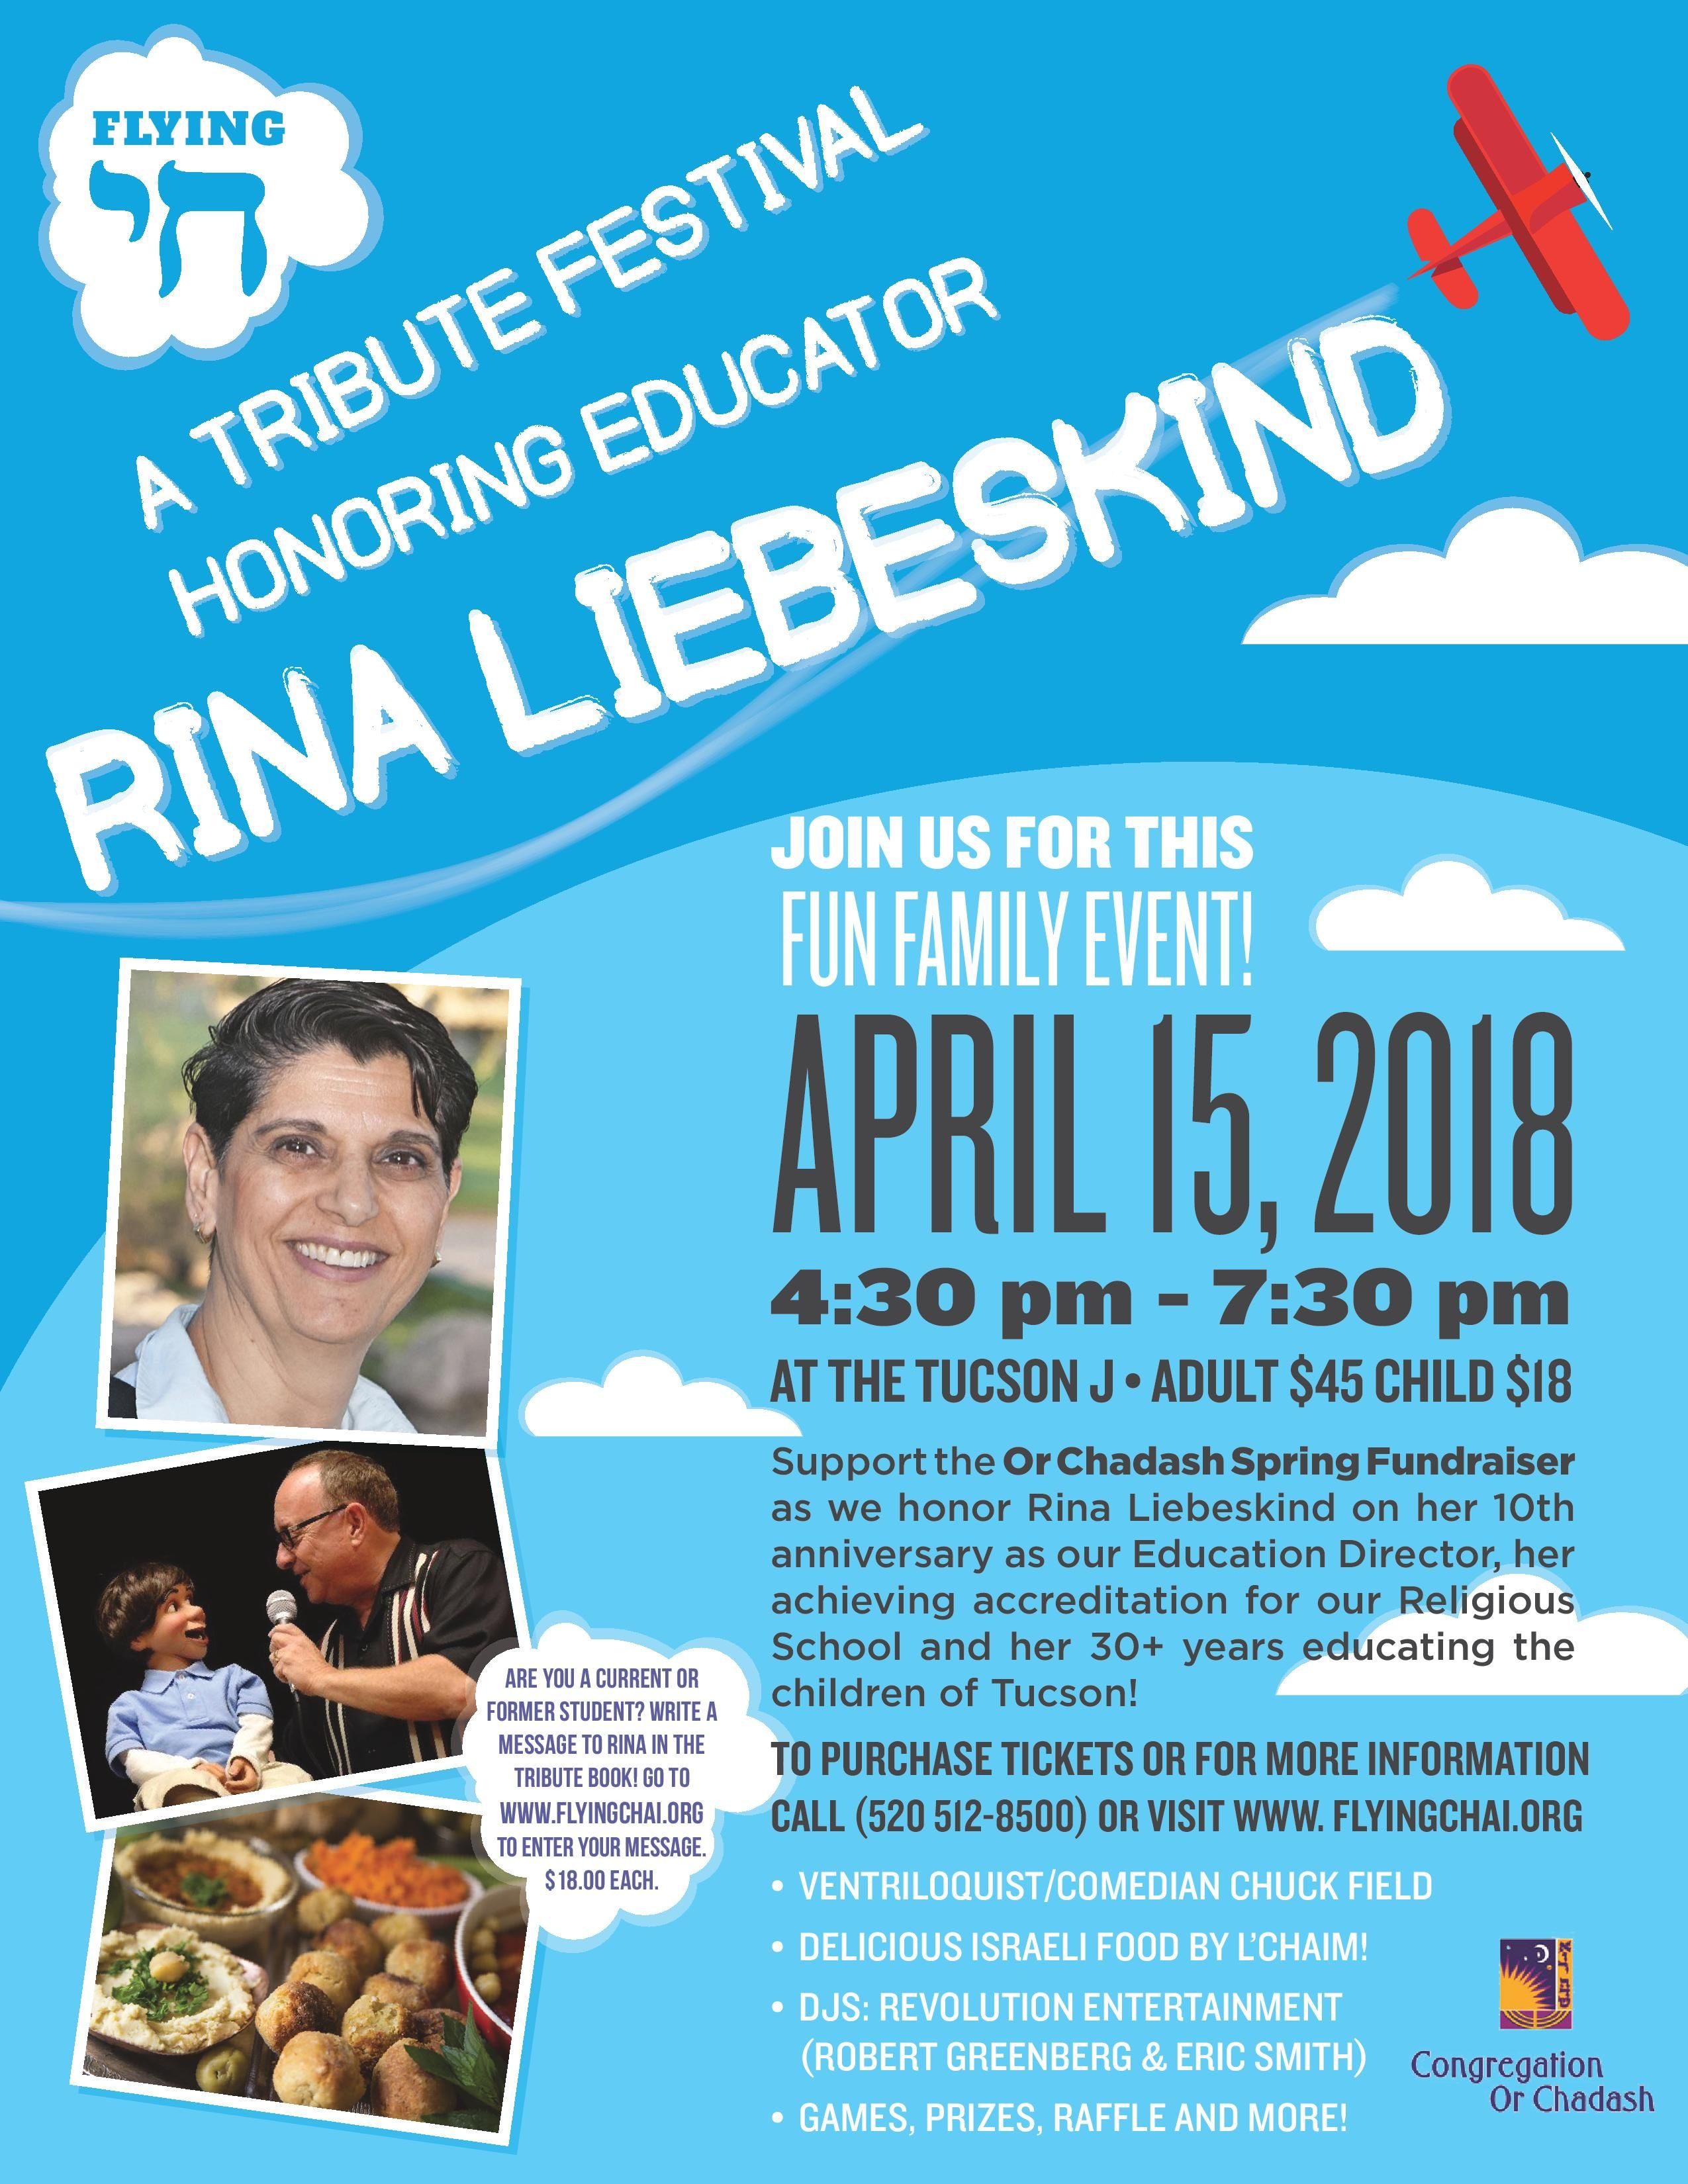 Flying High - A Tribute Festival Honoring Rina Liebeskind @ Tucson J | Tucson | Arizona | United States